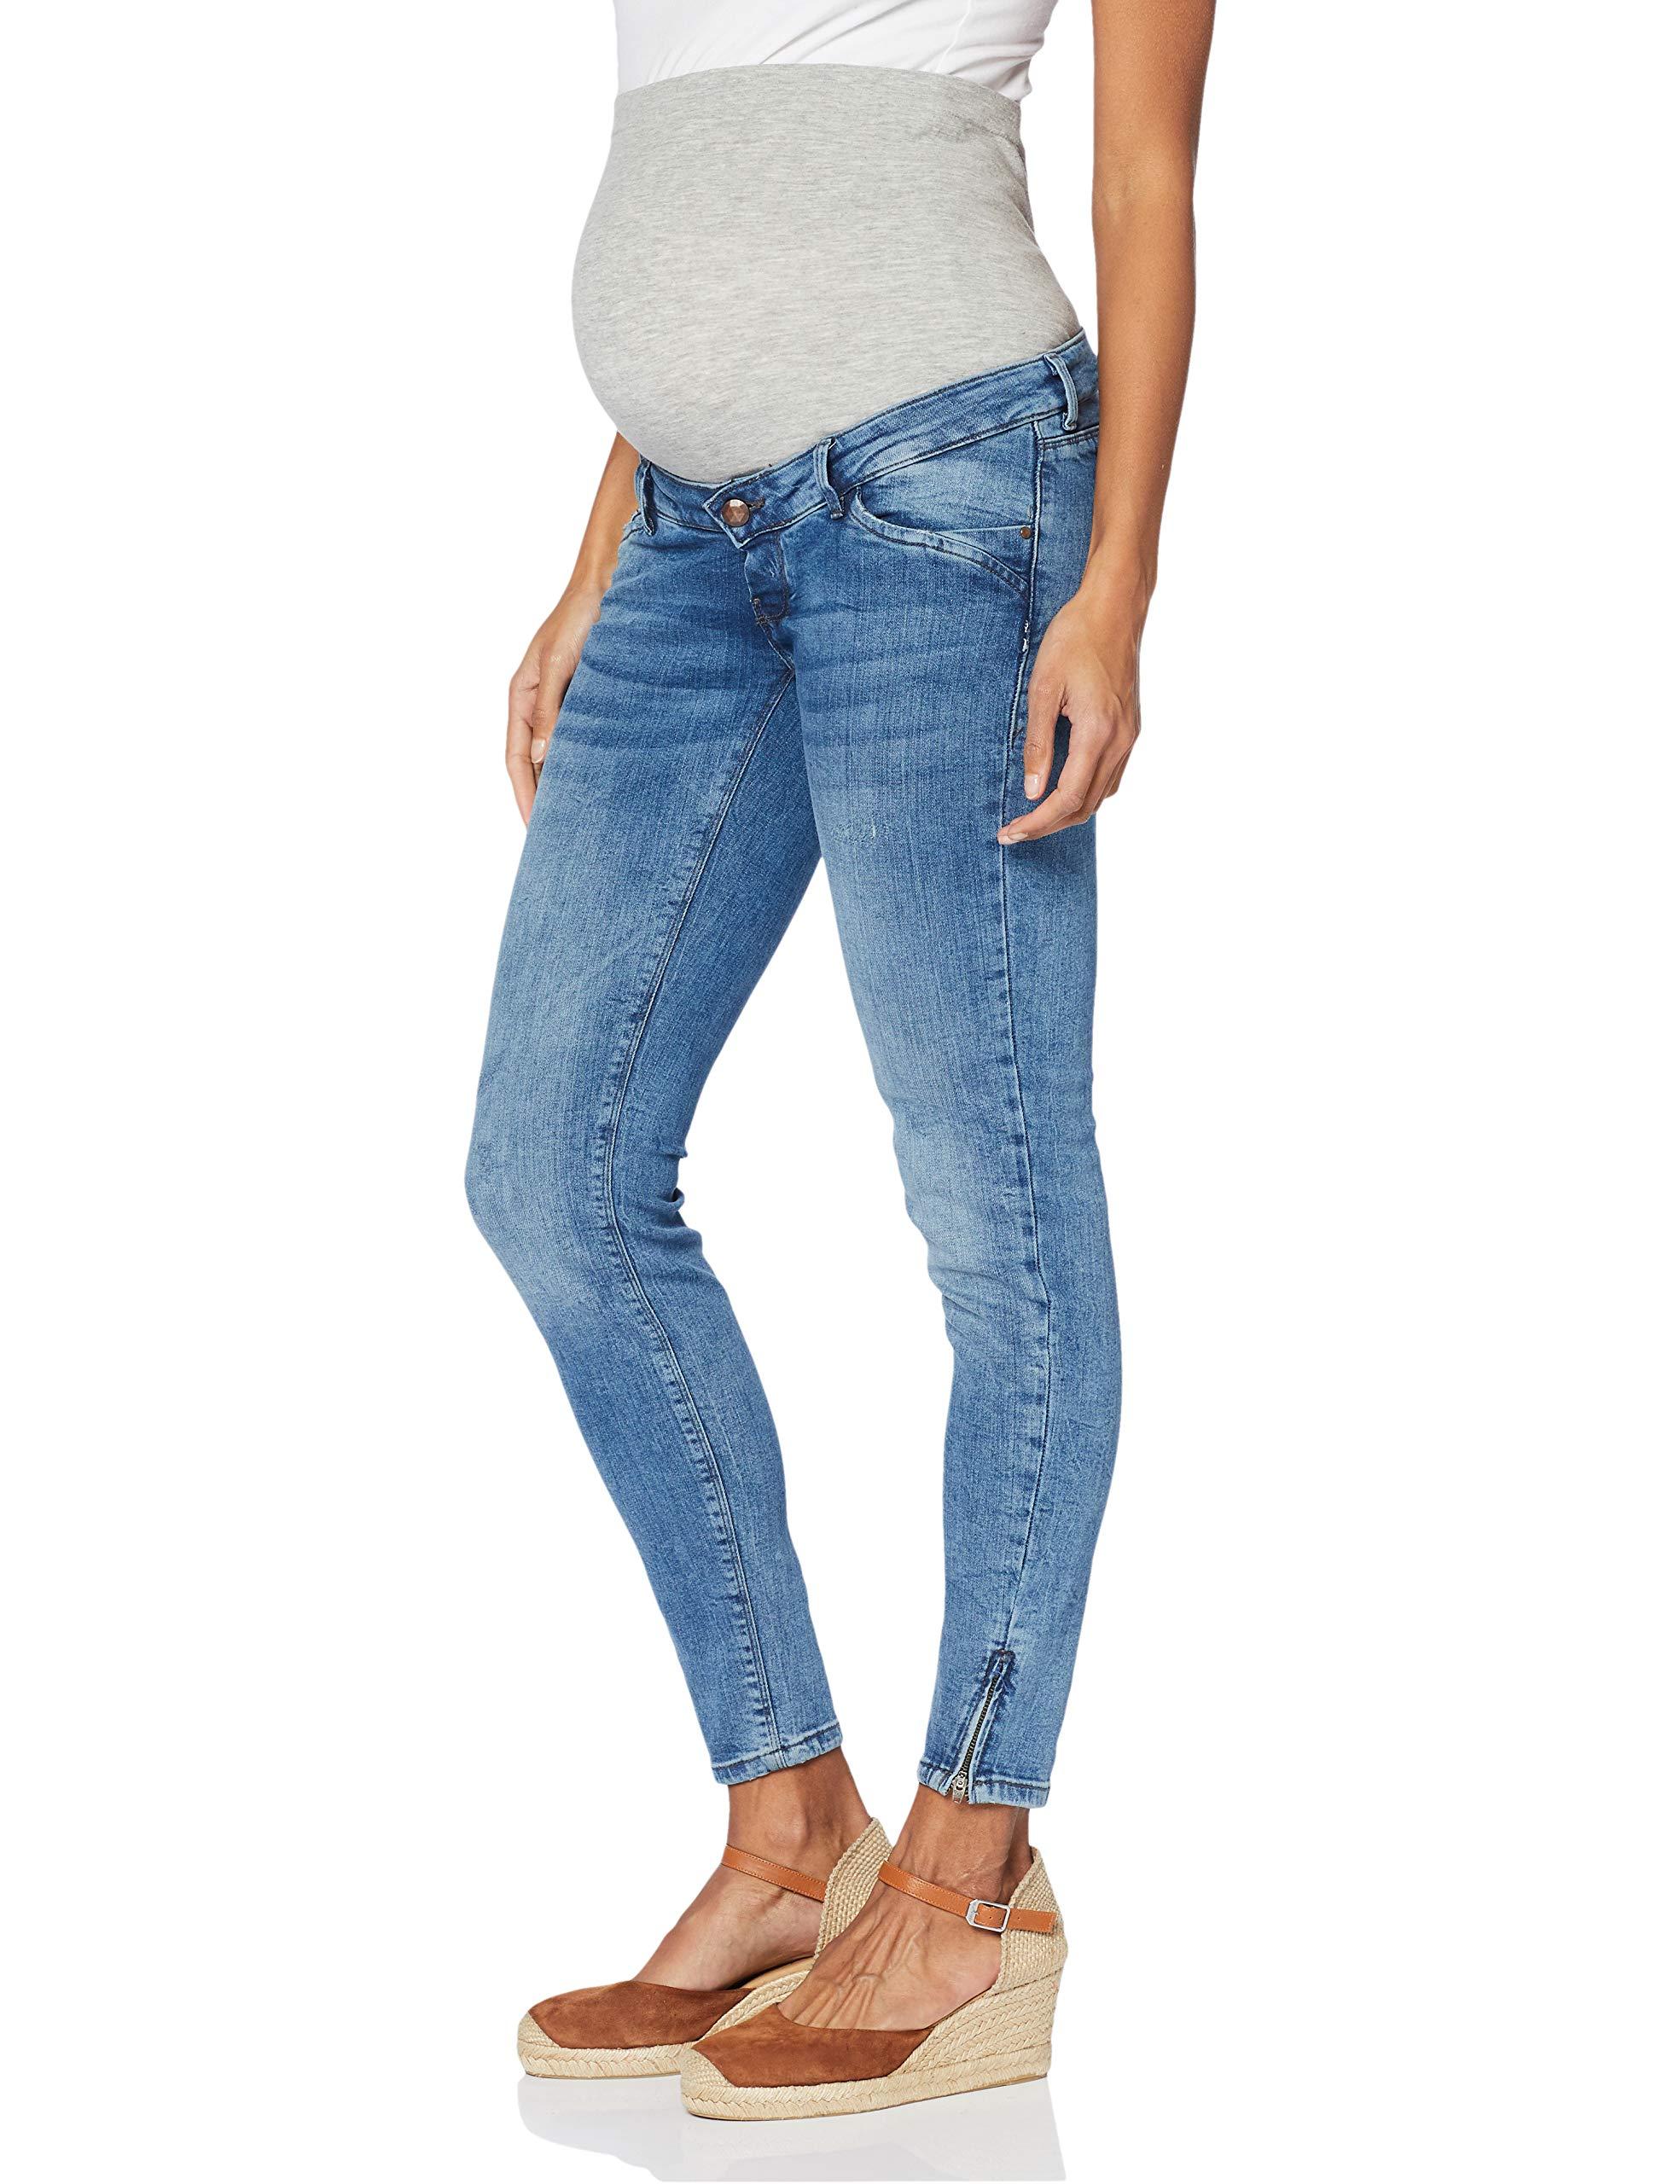 Slim Denim42taille PantalonsMaternitéBleu Mamalicious Mlcadiz Jeans Light Fabricant32Femme Blue Ybf76yg